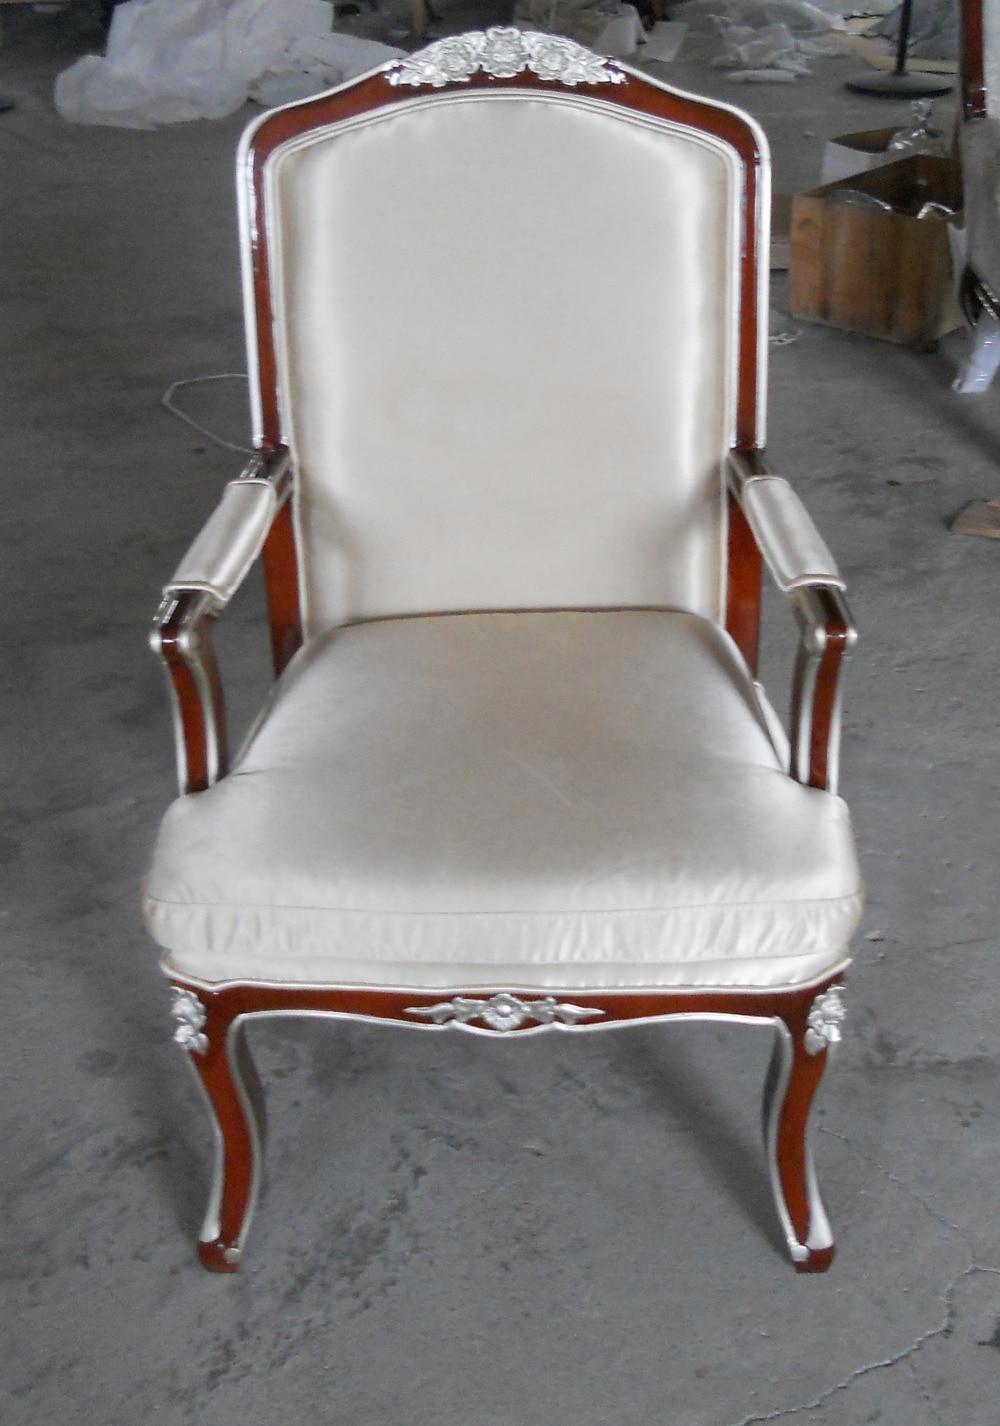 https://ae01.alicdn.com/kf/HTB1ZOrHKXXXXXbGXVXXq6xXFXXXD/Linnen-stof-bank-stoel-woonkamer-meubels-bank-fluwelen-doek-stoelen-woonkamer-sofa-stof-stoel-chesterfield-sofa.jpg